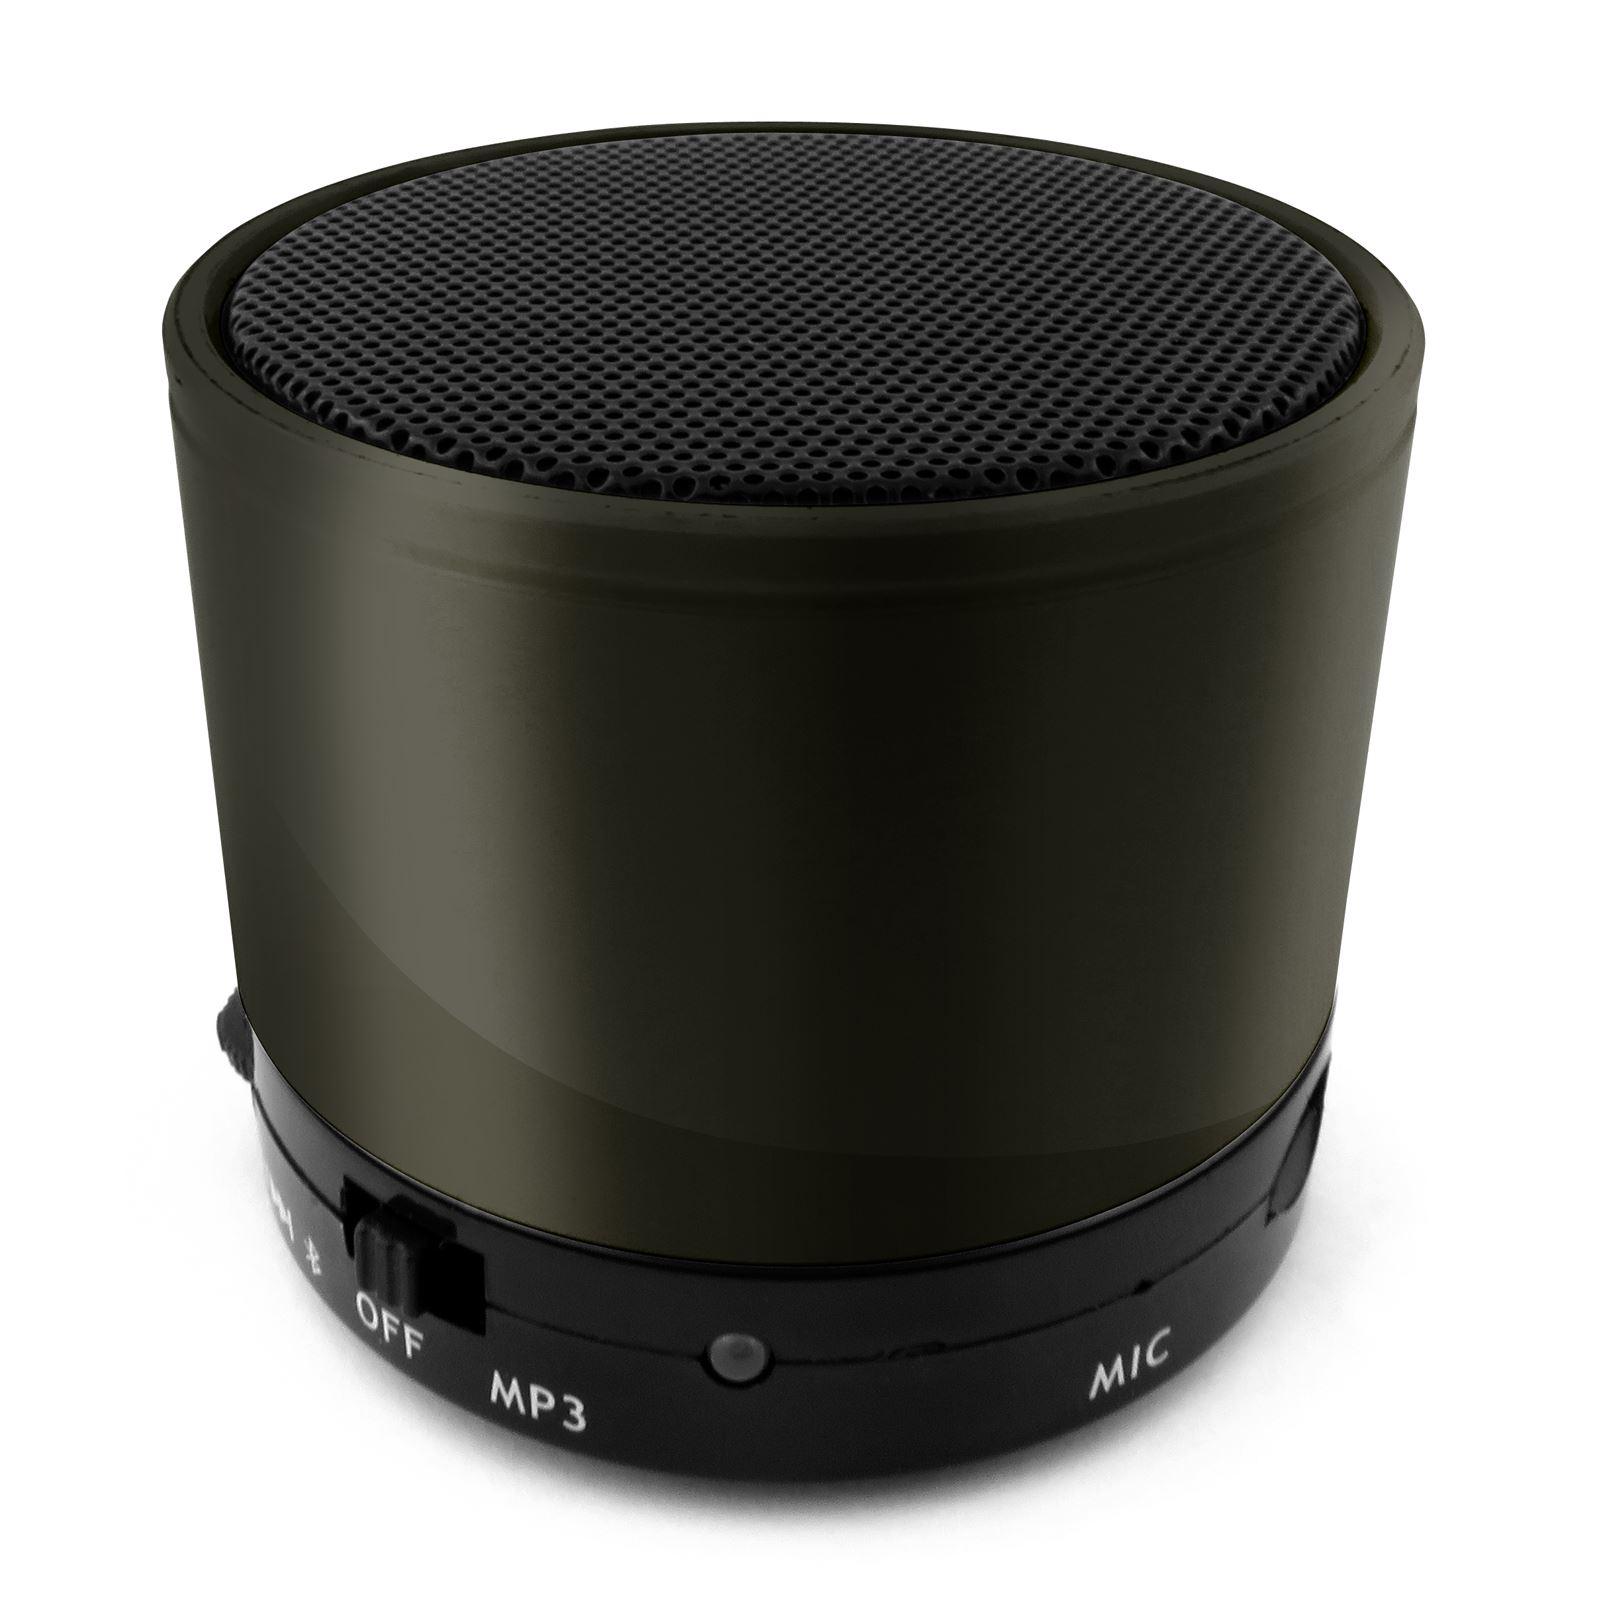 mini haut parleur bluetooth a2dp musique streaming mic mains libres micro fente pour carte sd ebay. Black Bedroom Furniture Sets. Home Design Ideas